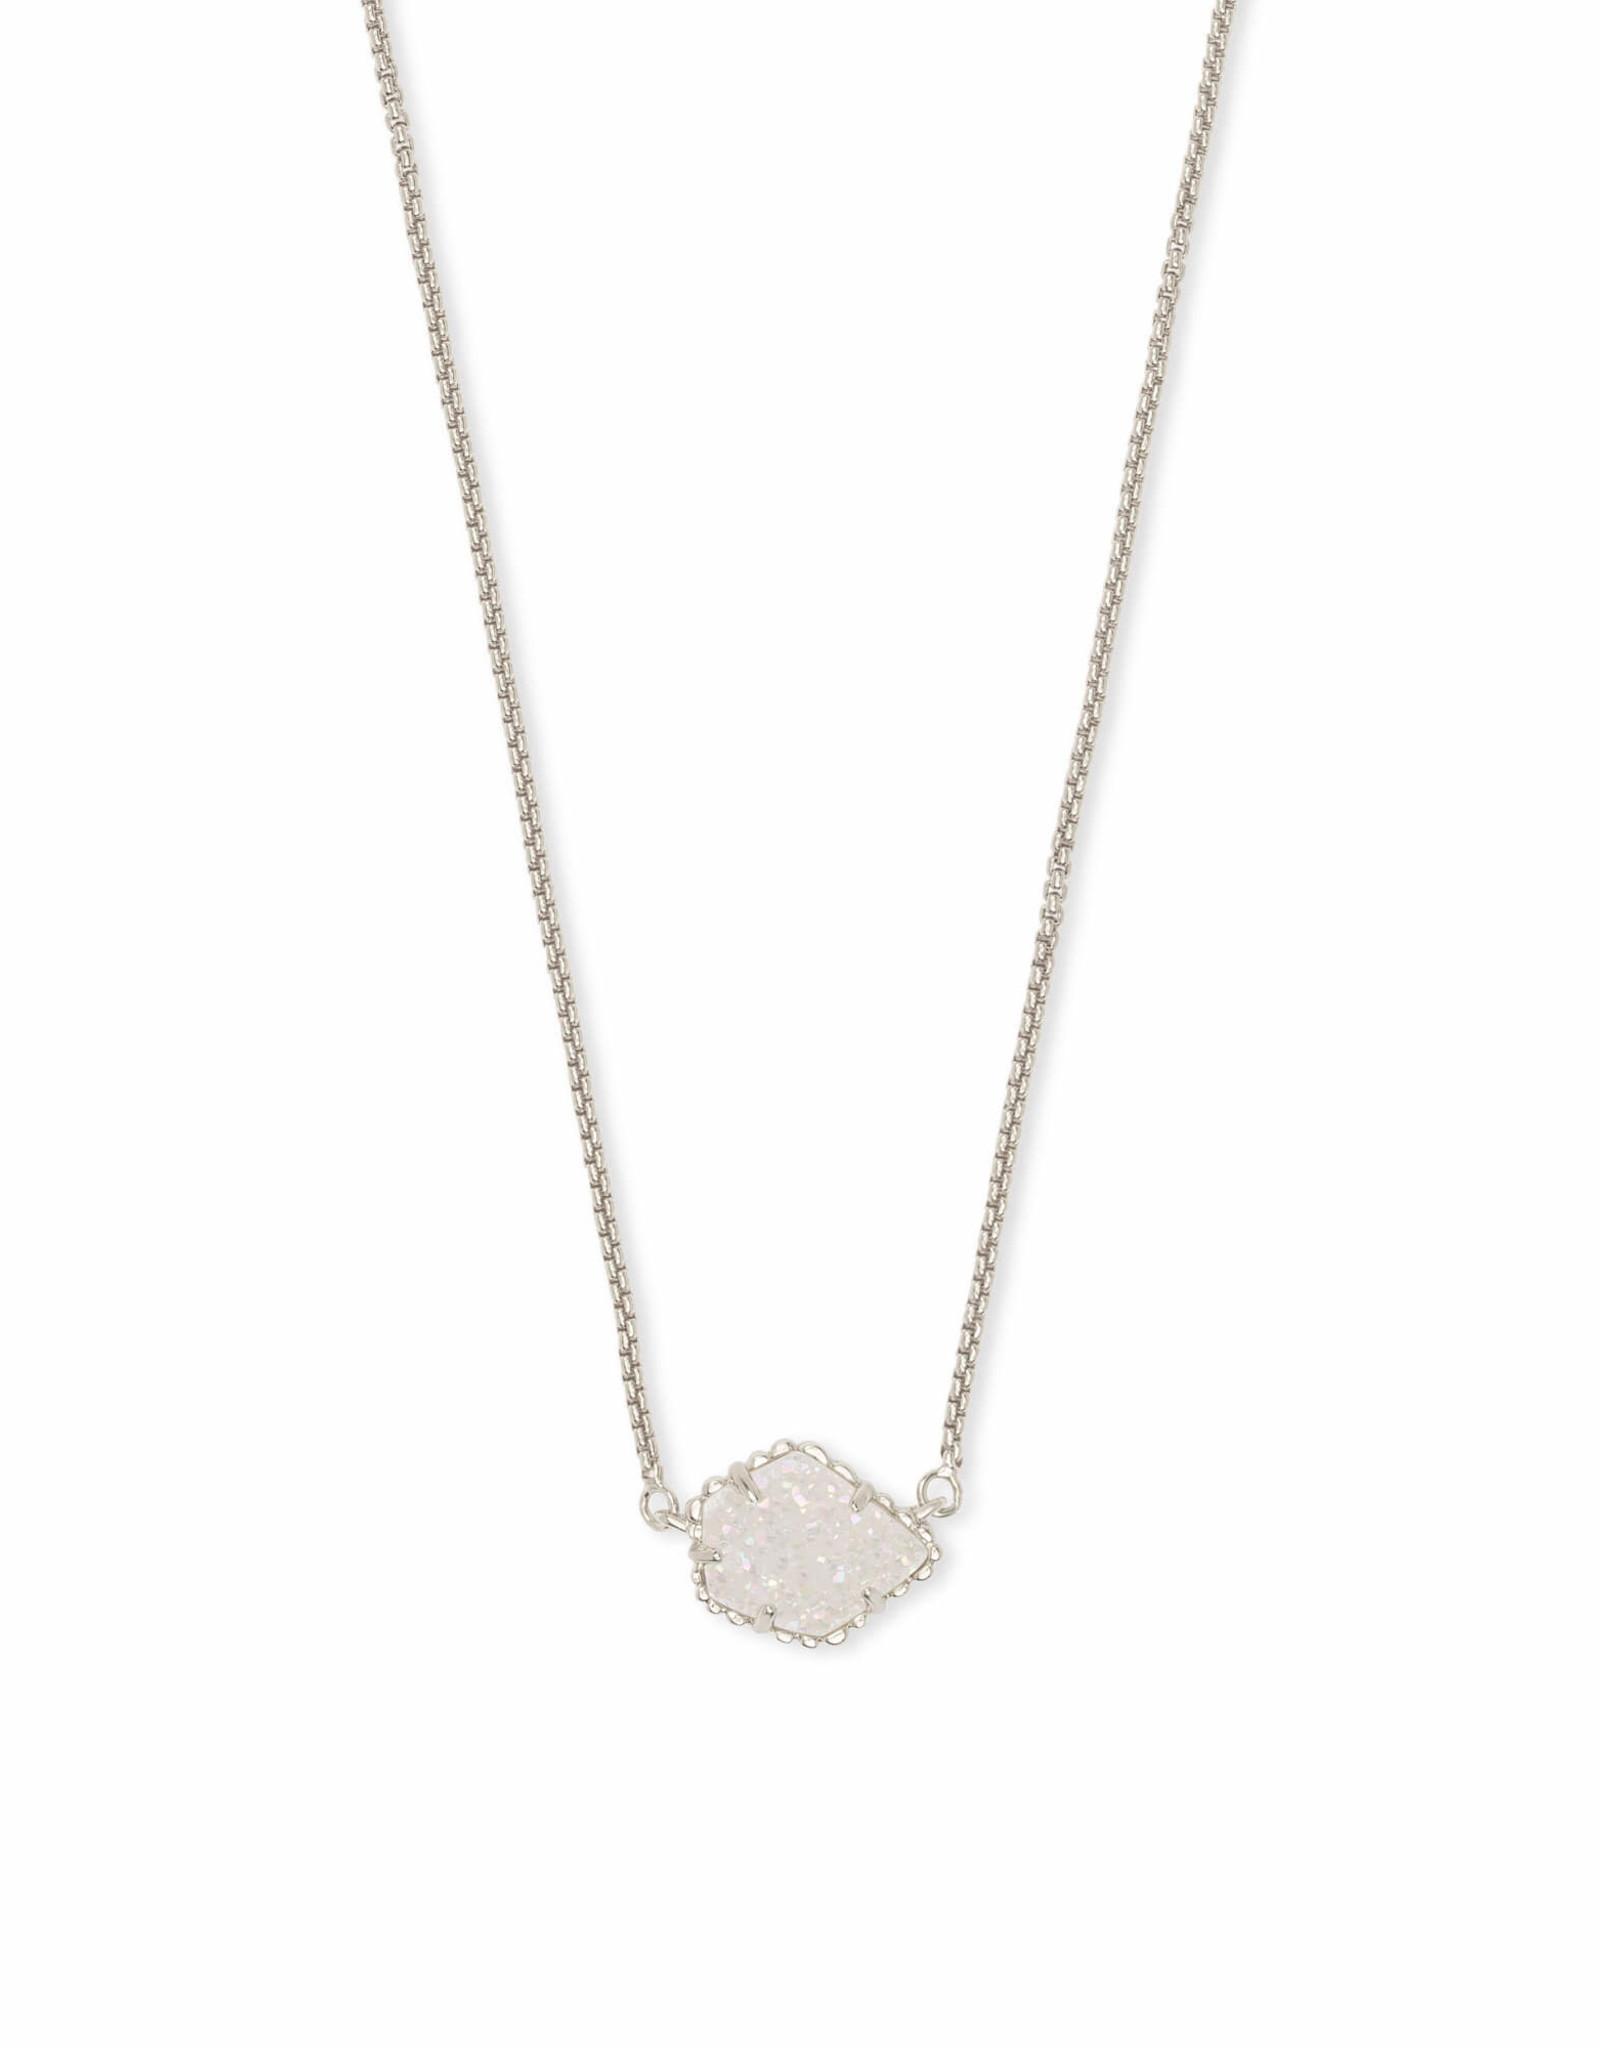 Kendra Scott Tess Necklace - Iridescent Drusy/Rhodium